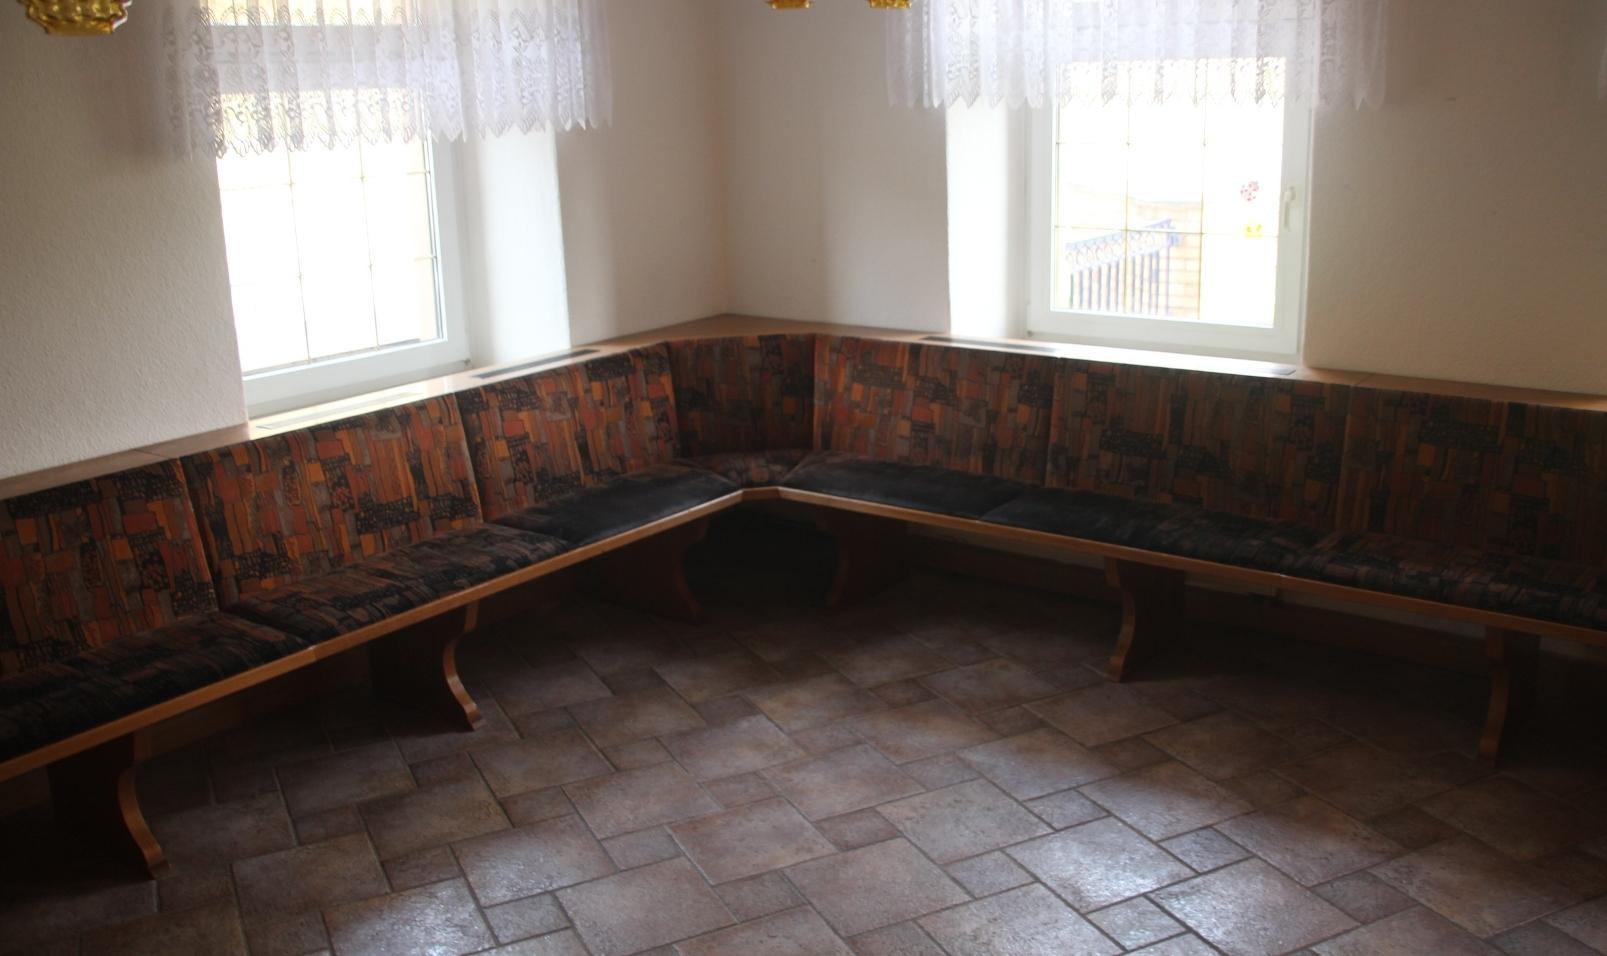 niedlich gastronomie sitzb nke galerie die designideen f r. Black Bedroom Furniture Sets. Home Design Ideas